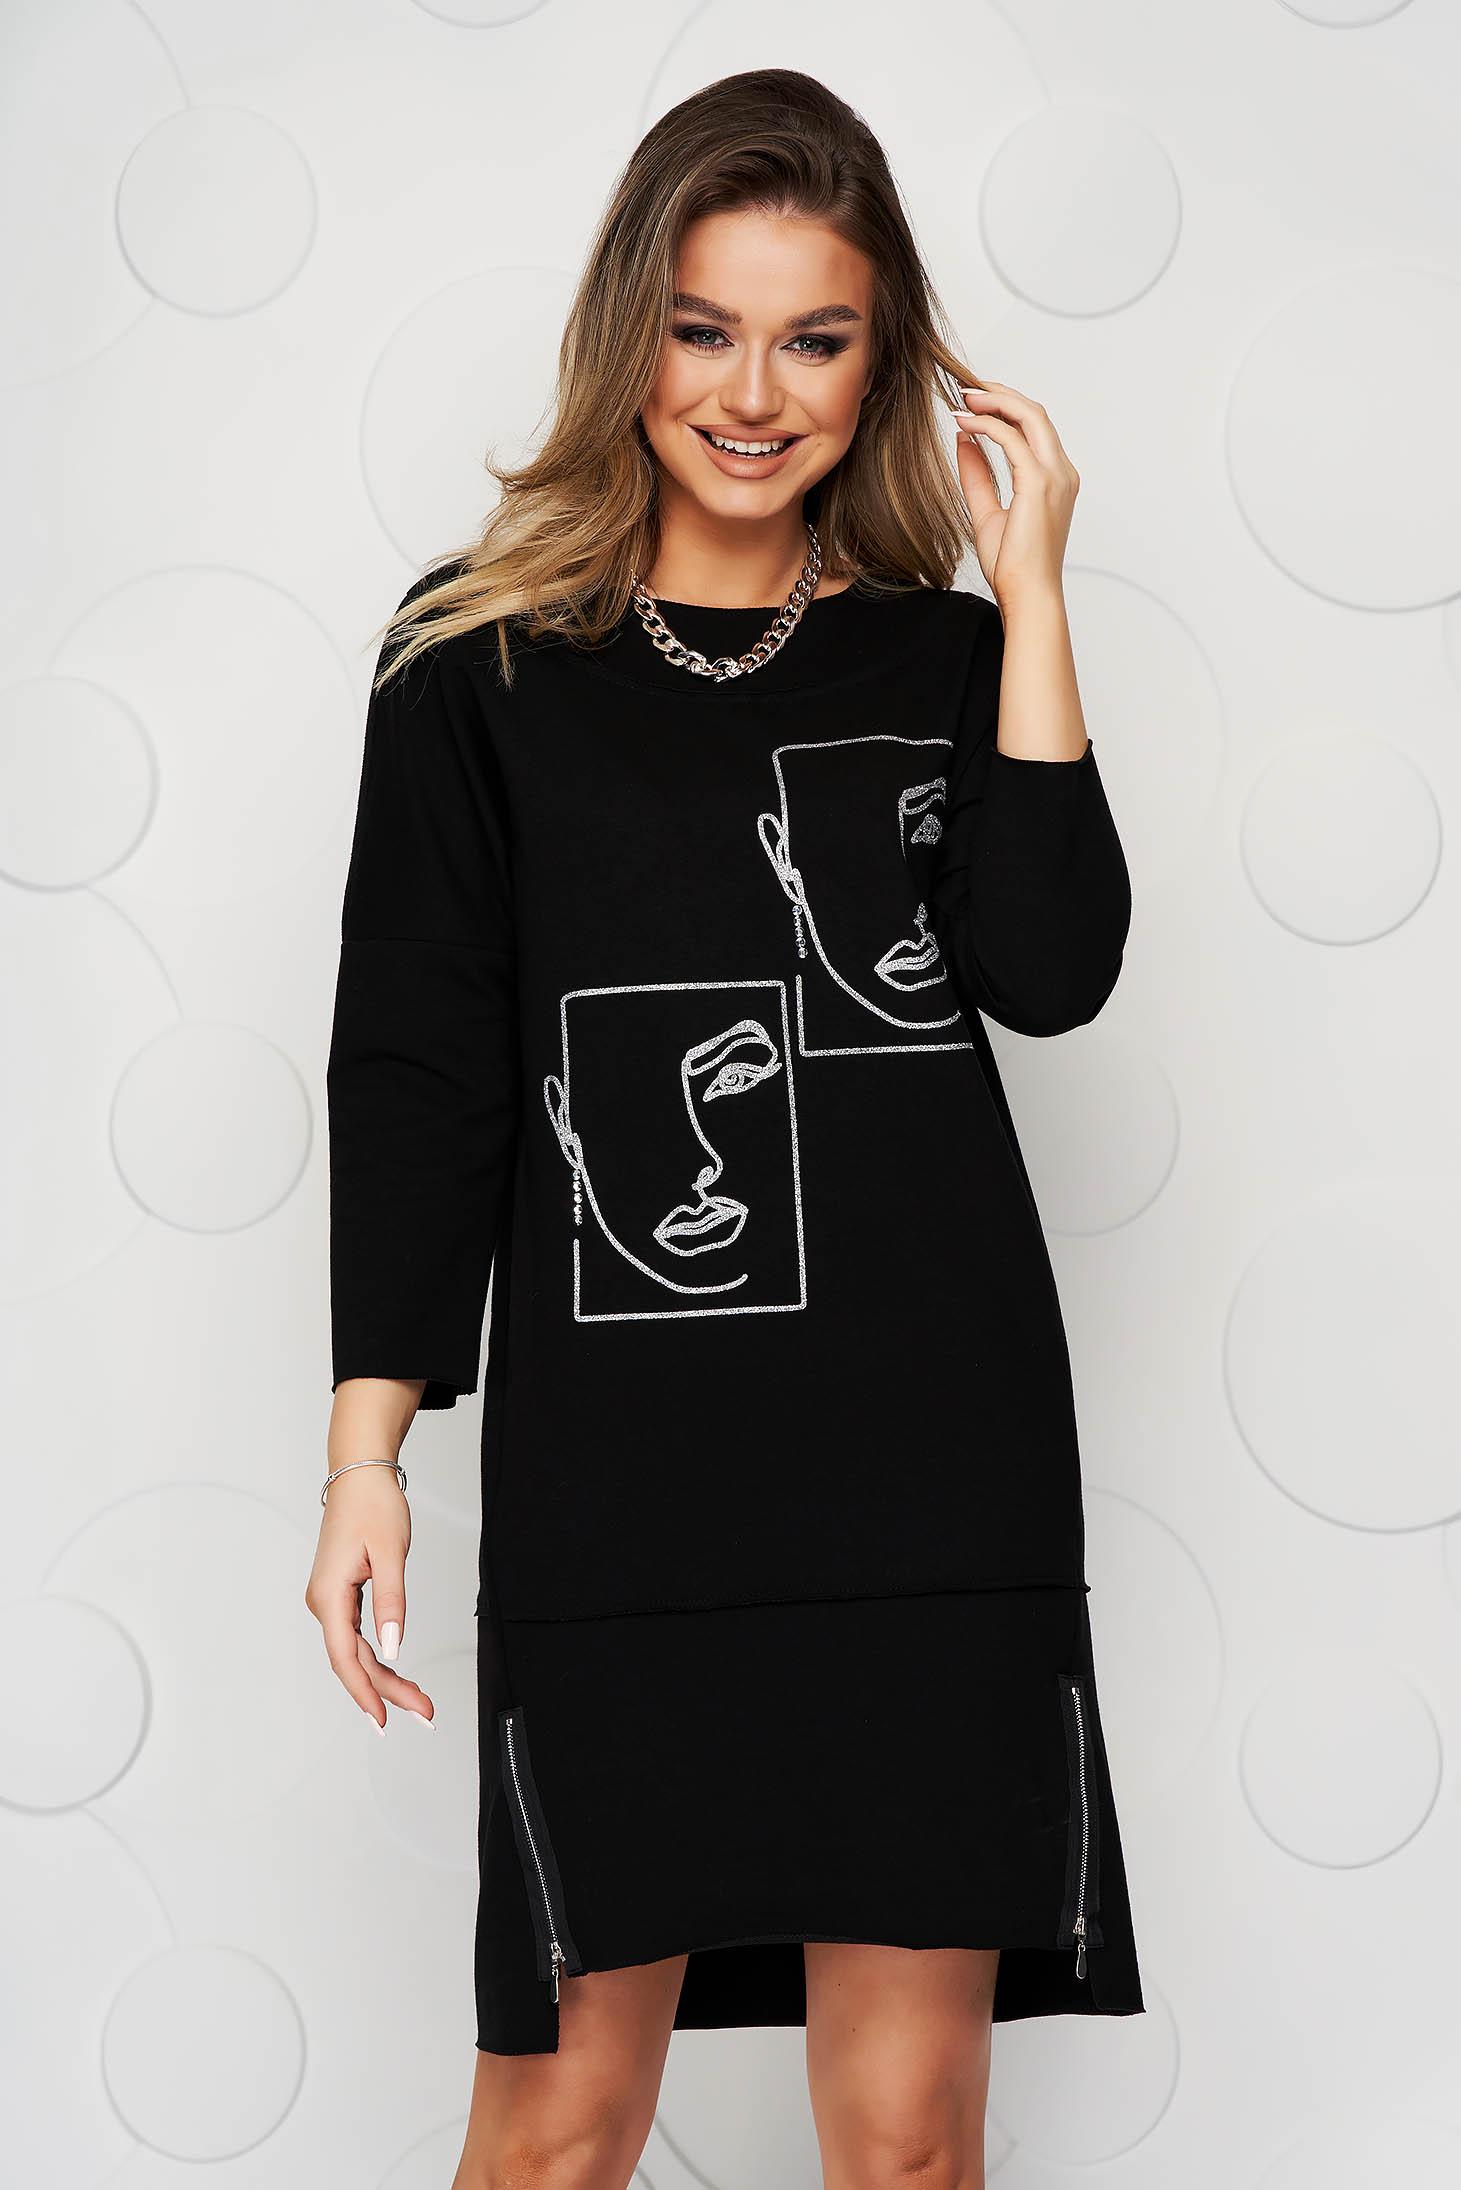 Rochie SunShine neagra midi din bumbac cu imprimeuri grafice cu croi larg si fermoare